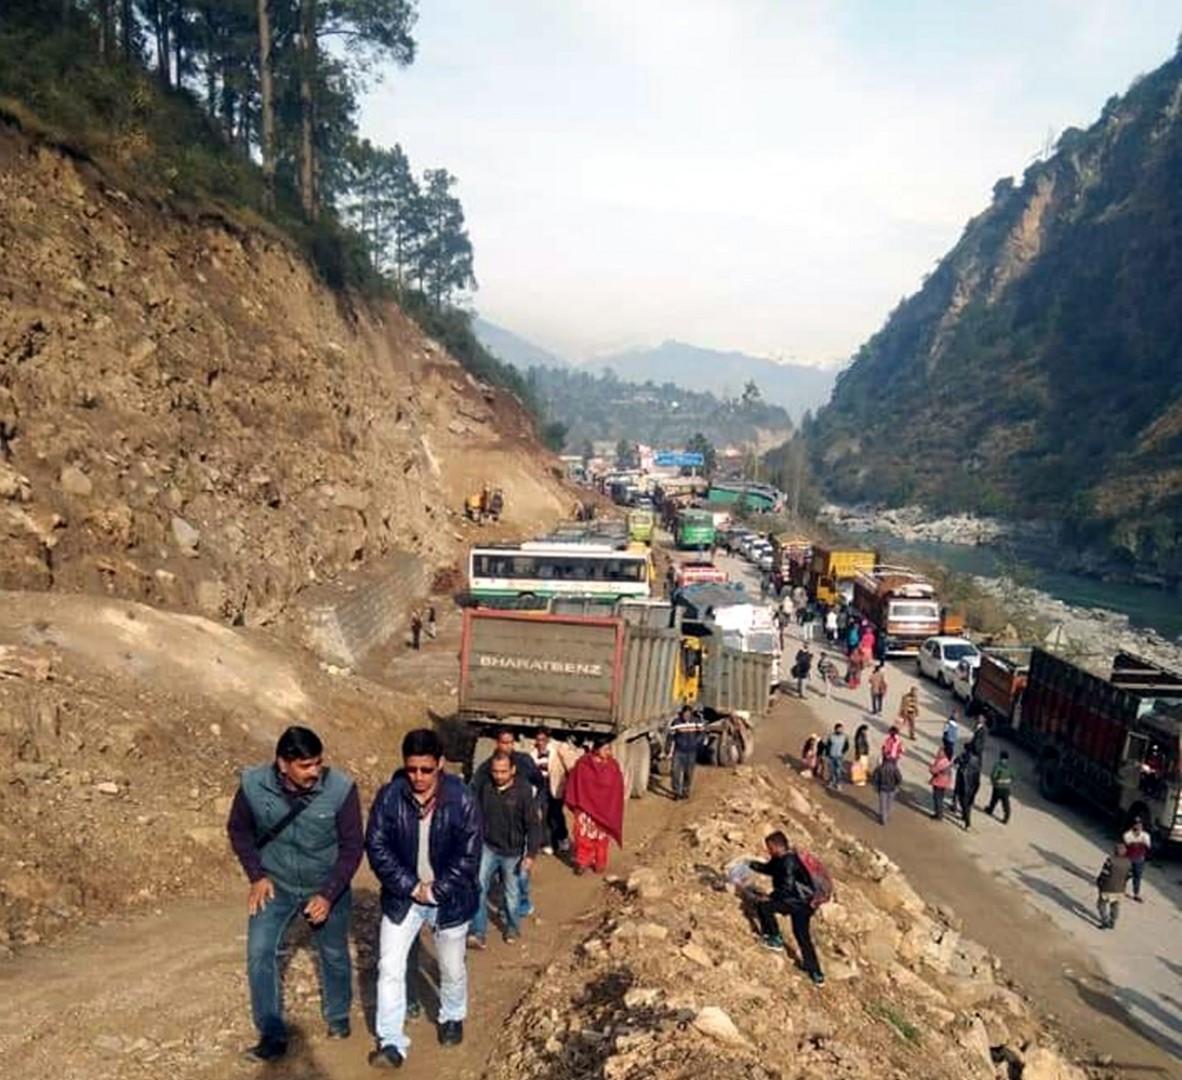 Landslide blocks stretch of Chandigarh-Manali highway: